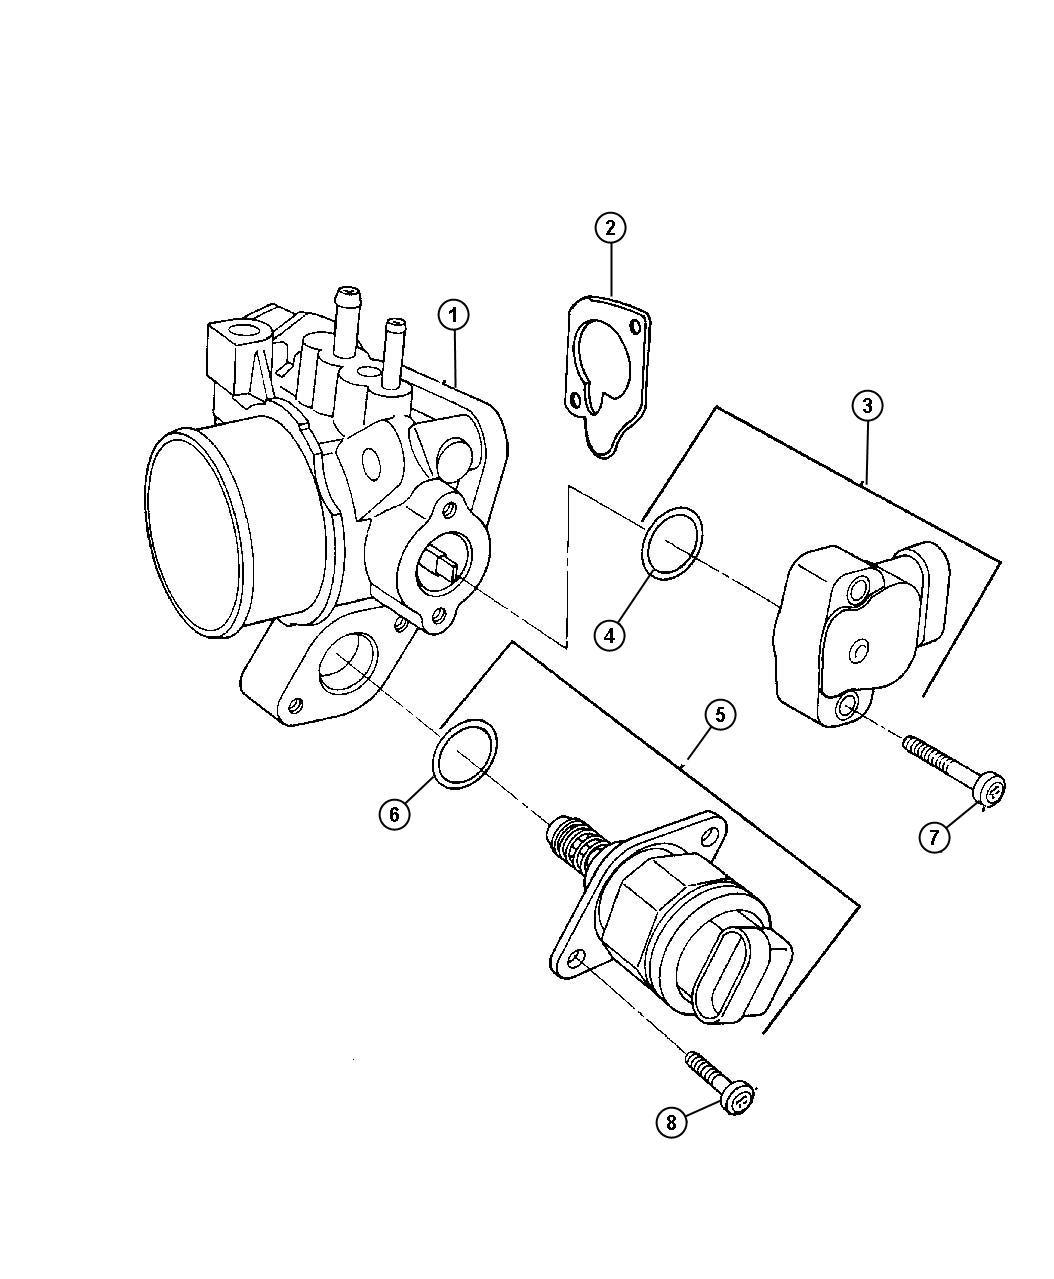 ohv v6 engine diagram